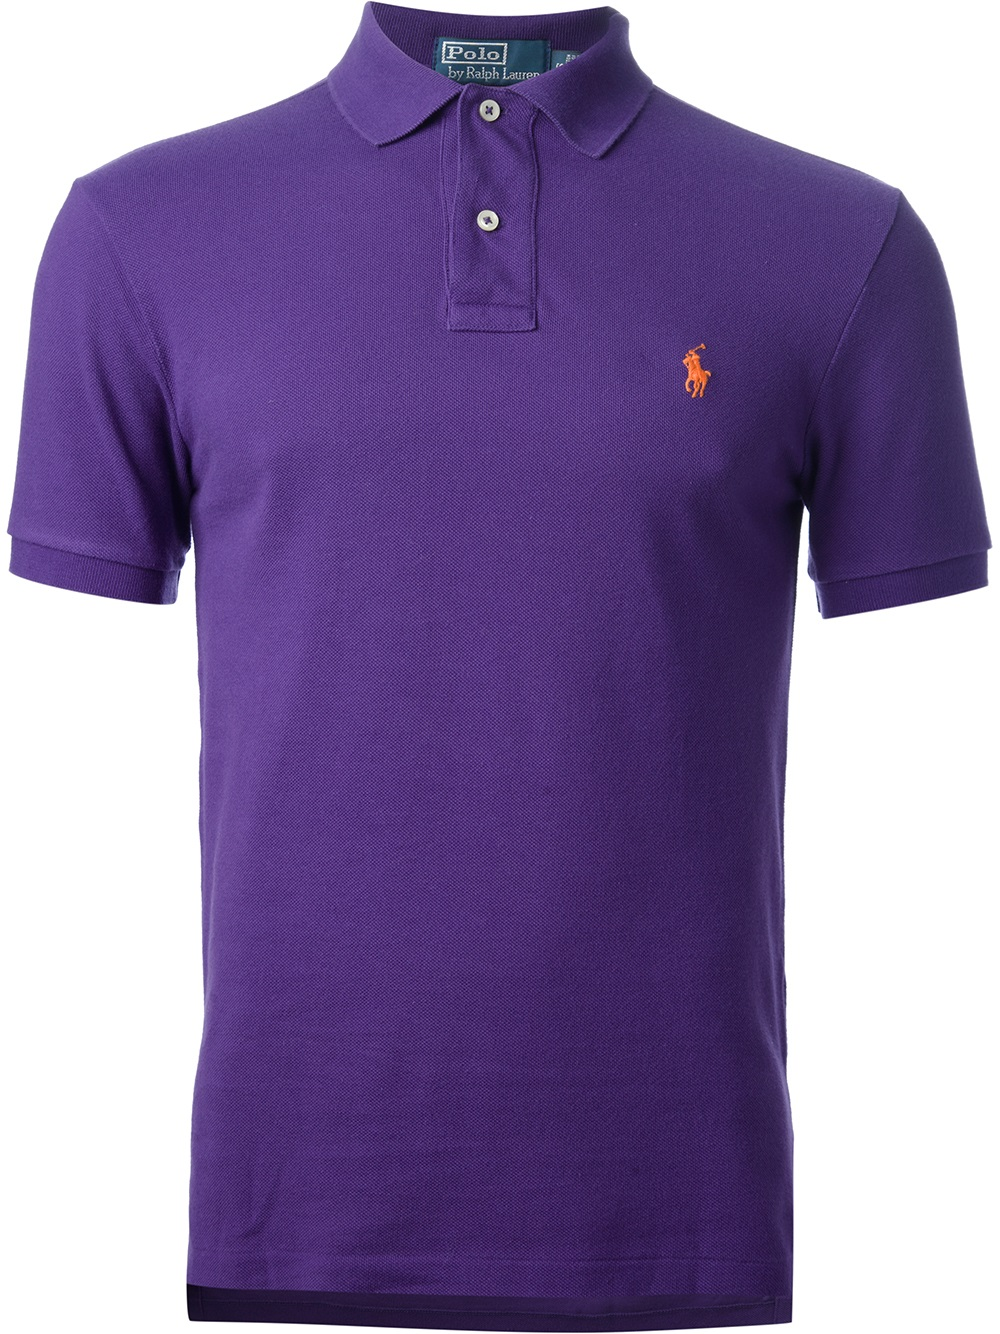 Lyst polo ralph lauren short sleeve polo shirt in purple for Long sleeve purple polo shirt